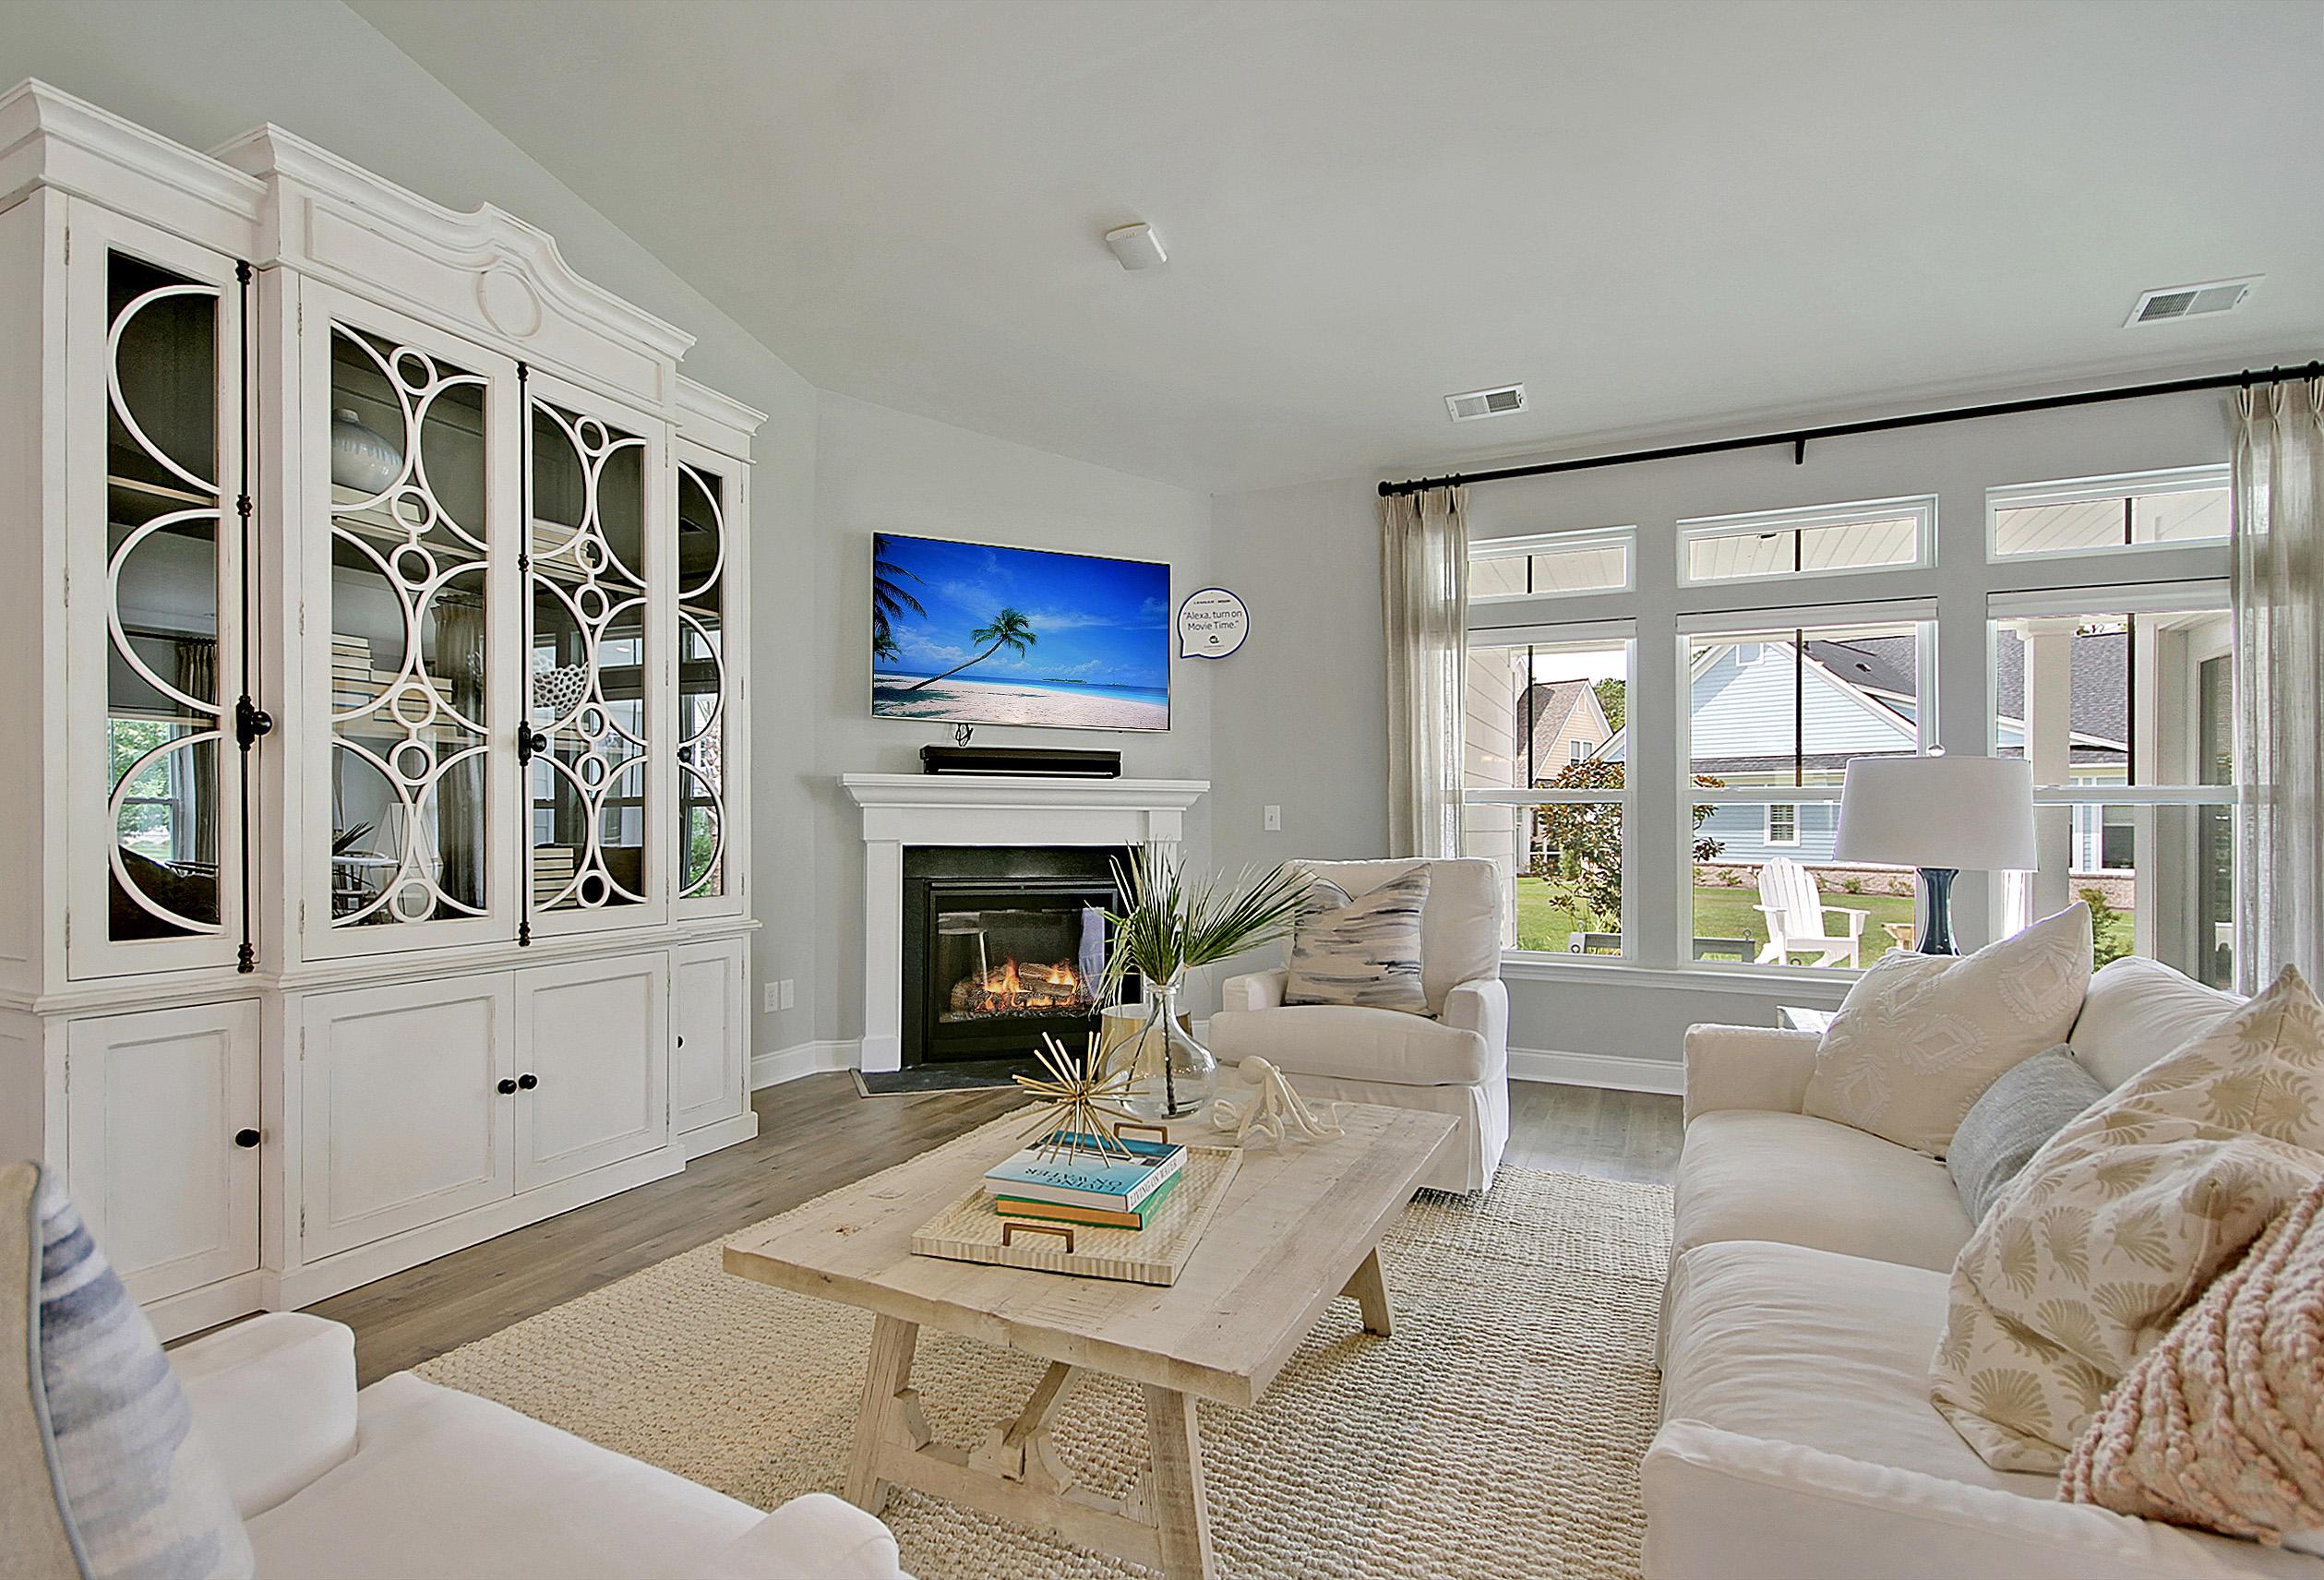 Park West Homes For Sale - 3066 Rice Field, Mount Pleasant, SC - 23